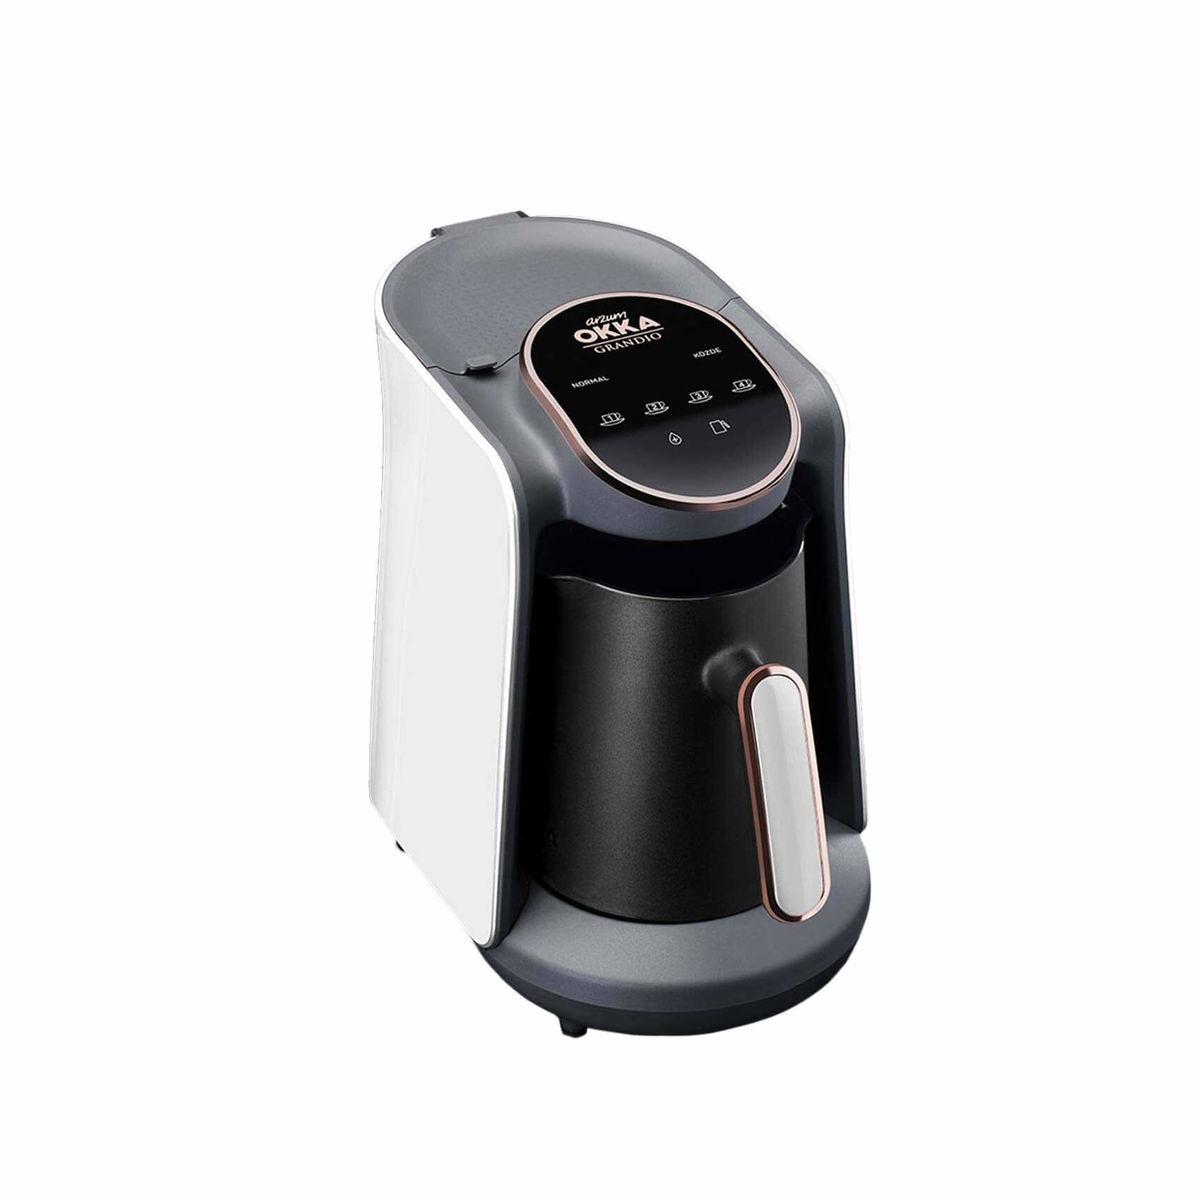 Image of Arzum OK005-B Grandio Espressomaschine weiss